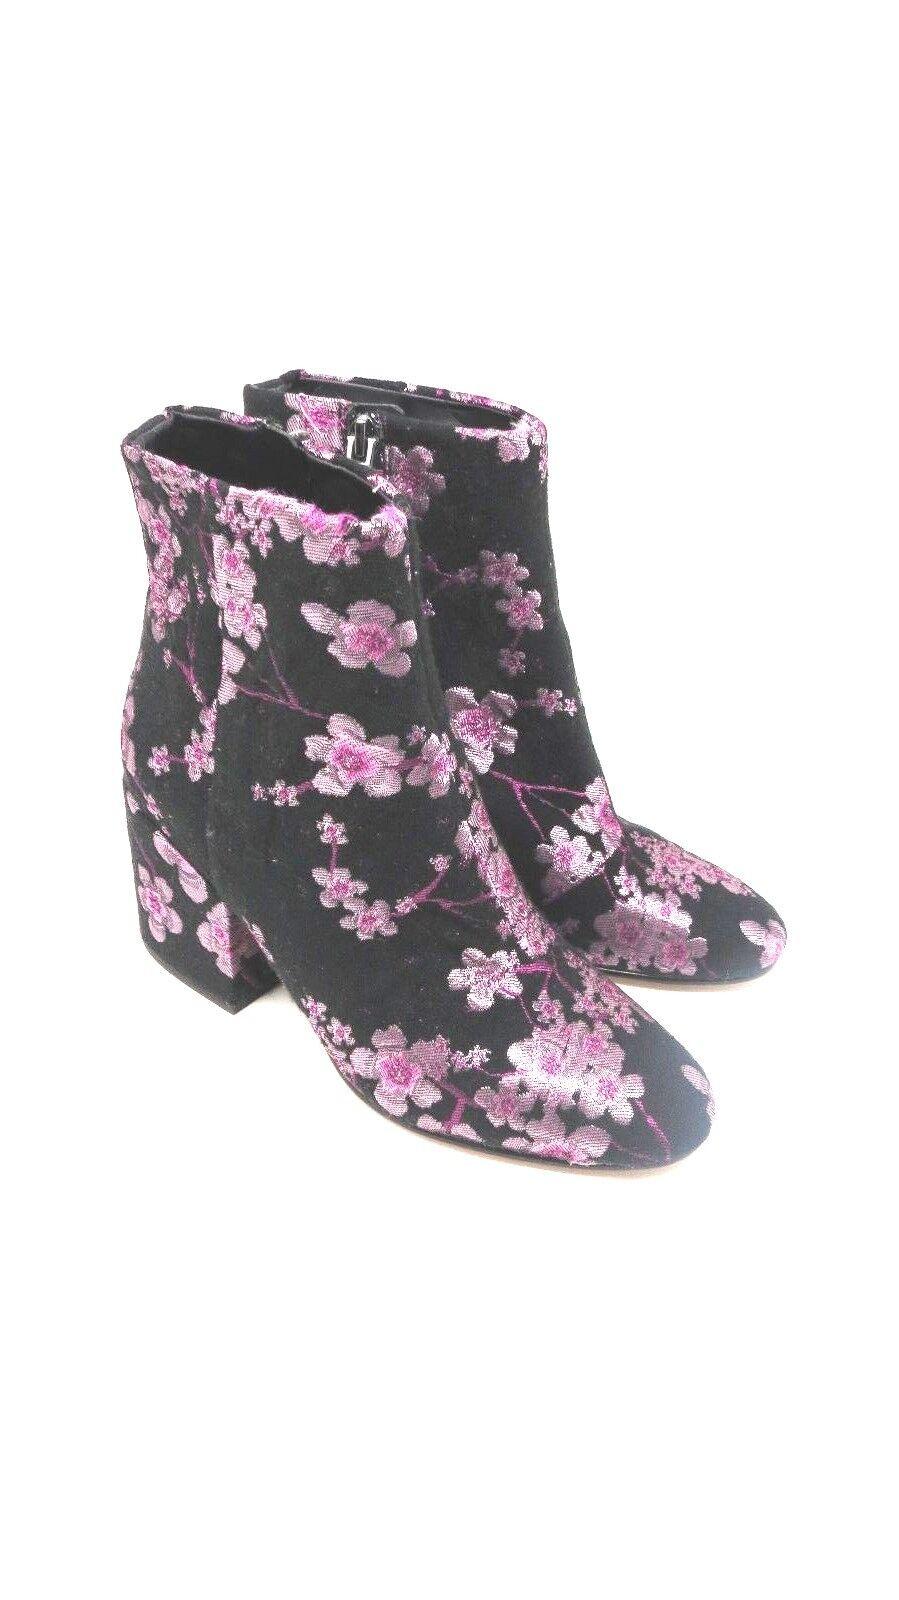 Sam Edelman  Taye Black Color Pink Floral  Boots  Size 6